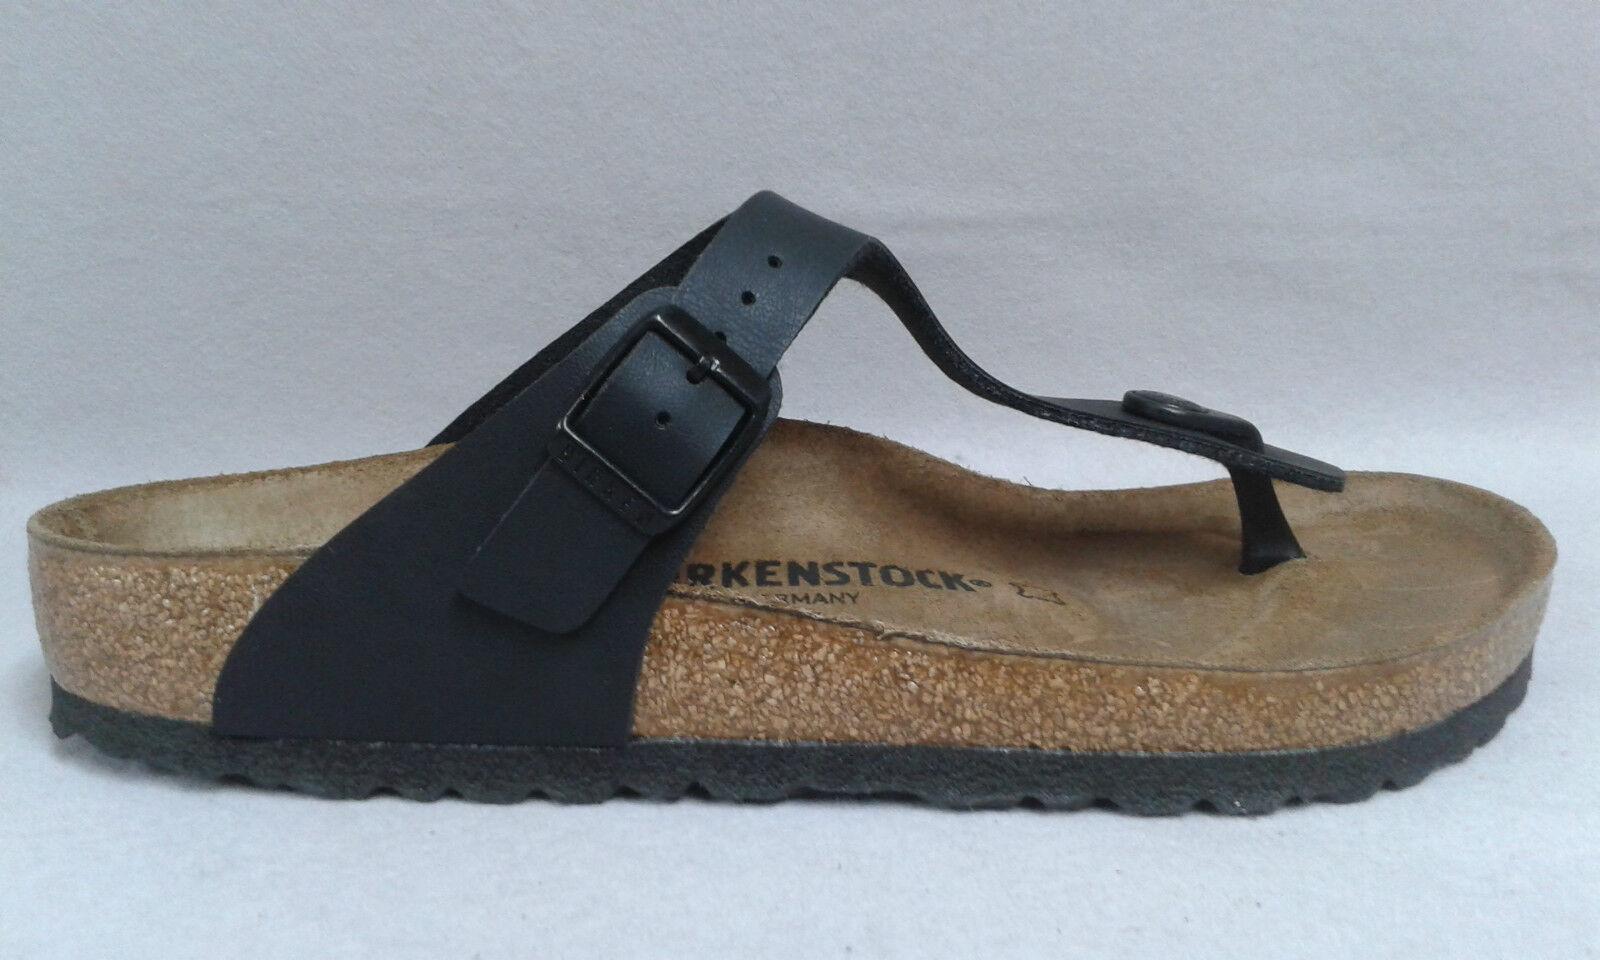 Birkenstock Gizeh schwarz Pantolette Zehensteg Fußbett Kork Zehentrenner 9020